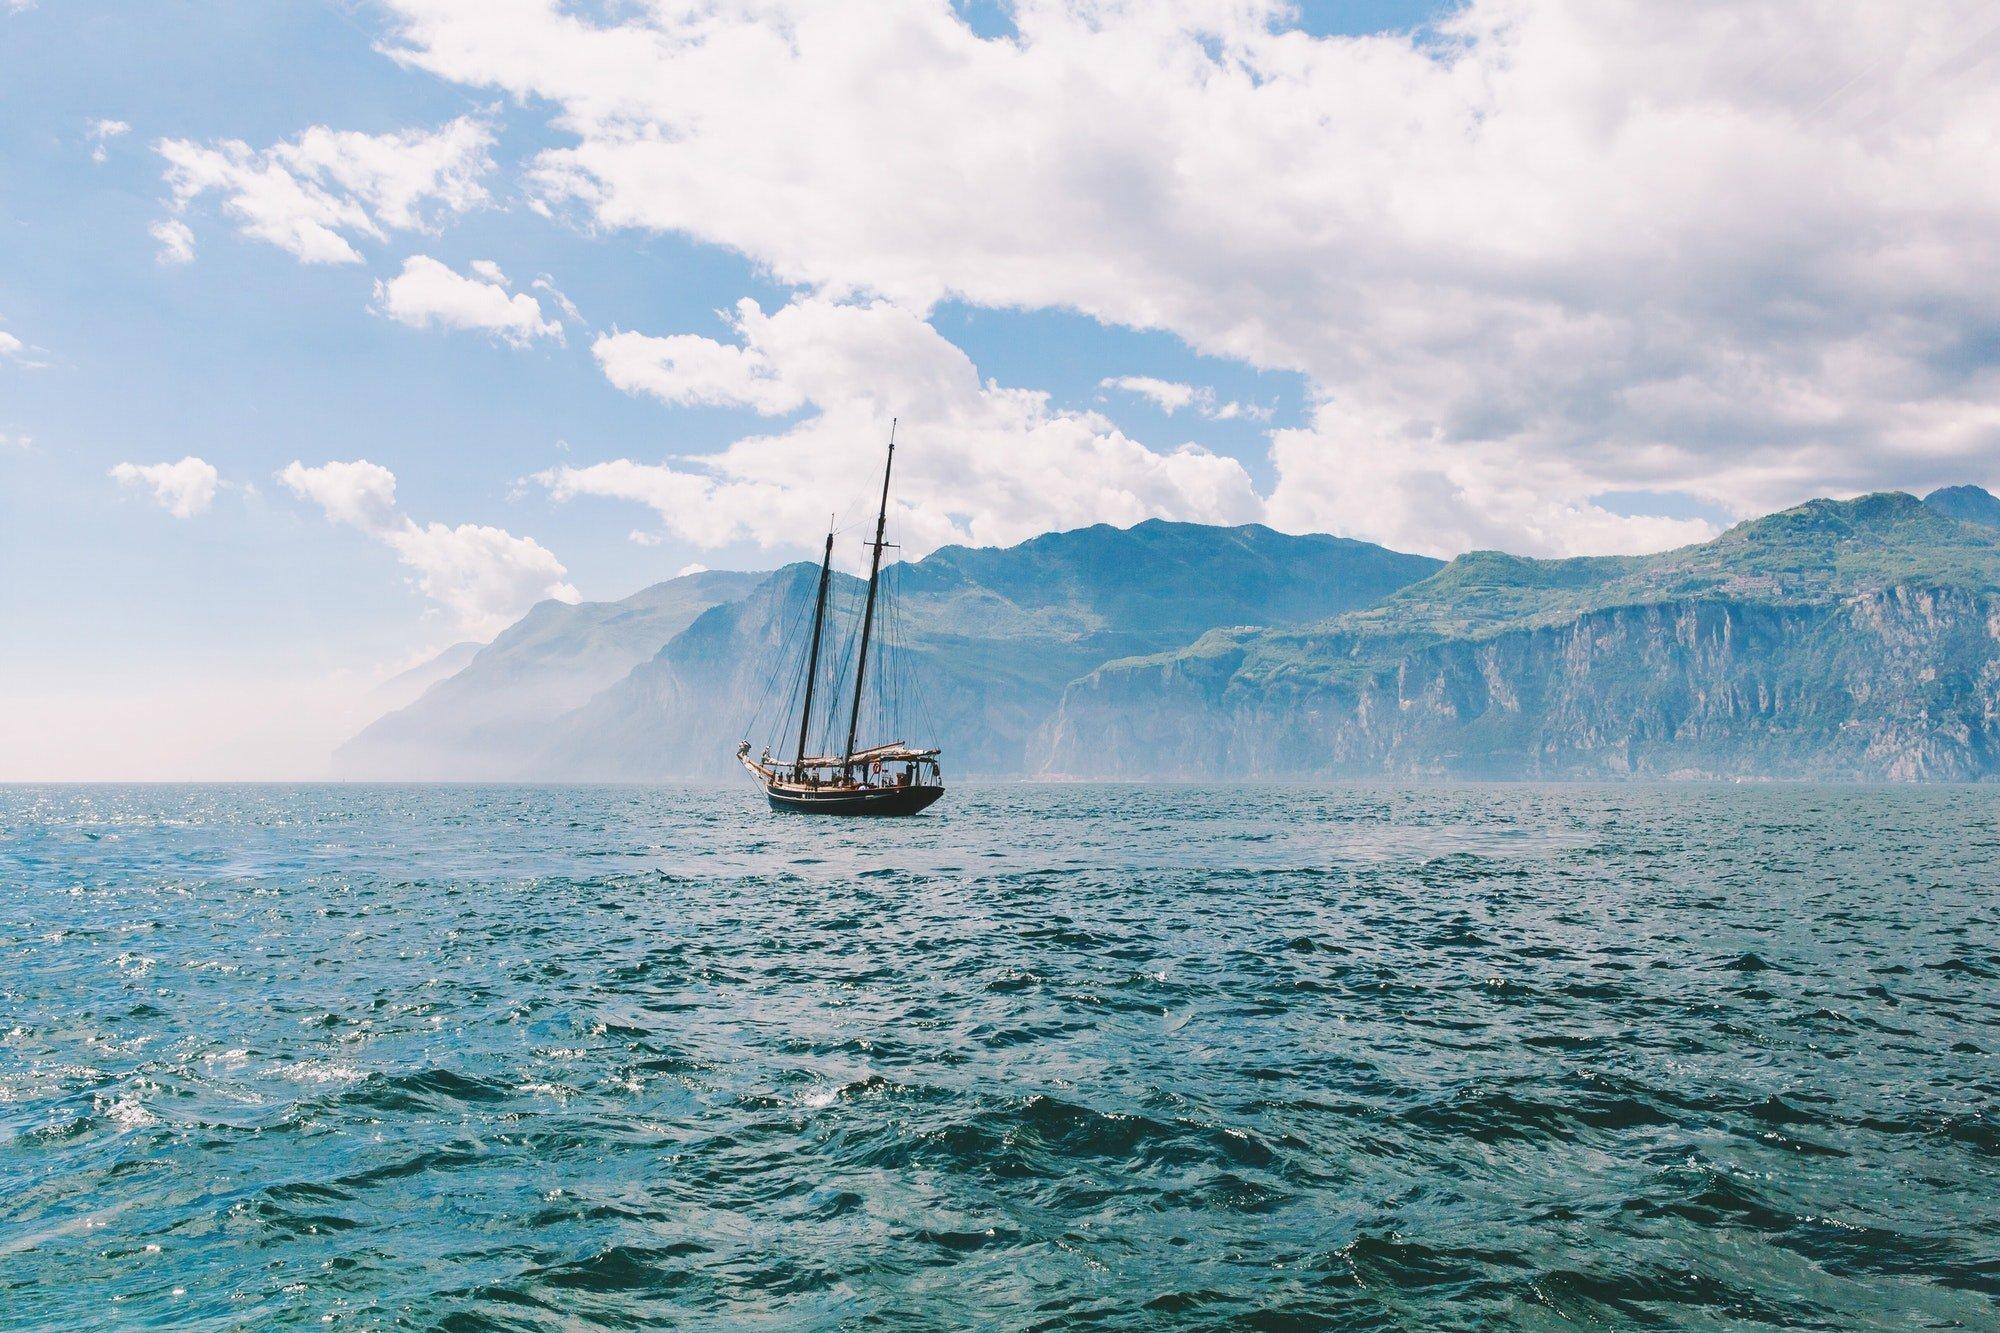 Boat on the lake Garda